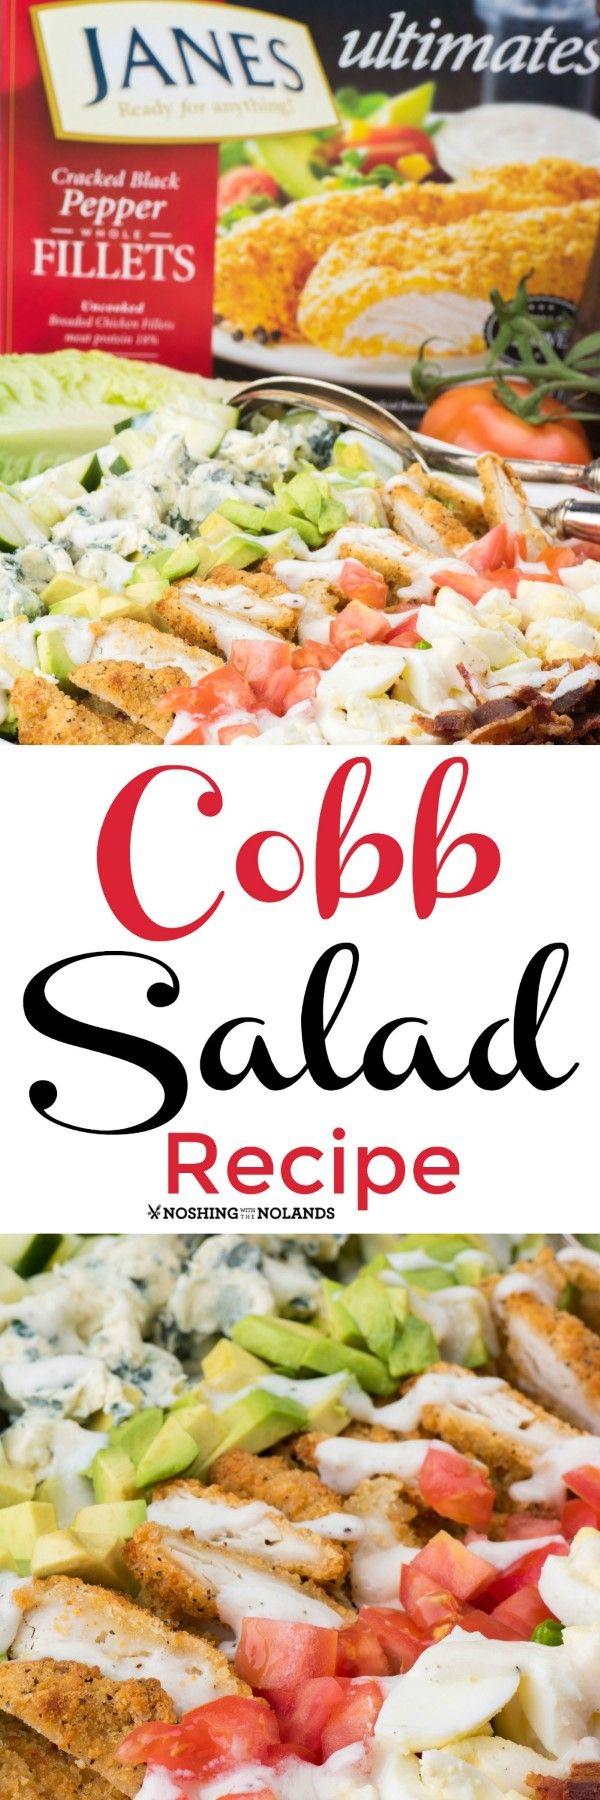 Cobb Salad Recipe via @tnoland